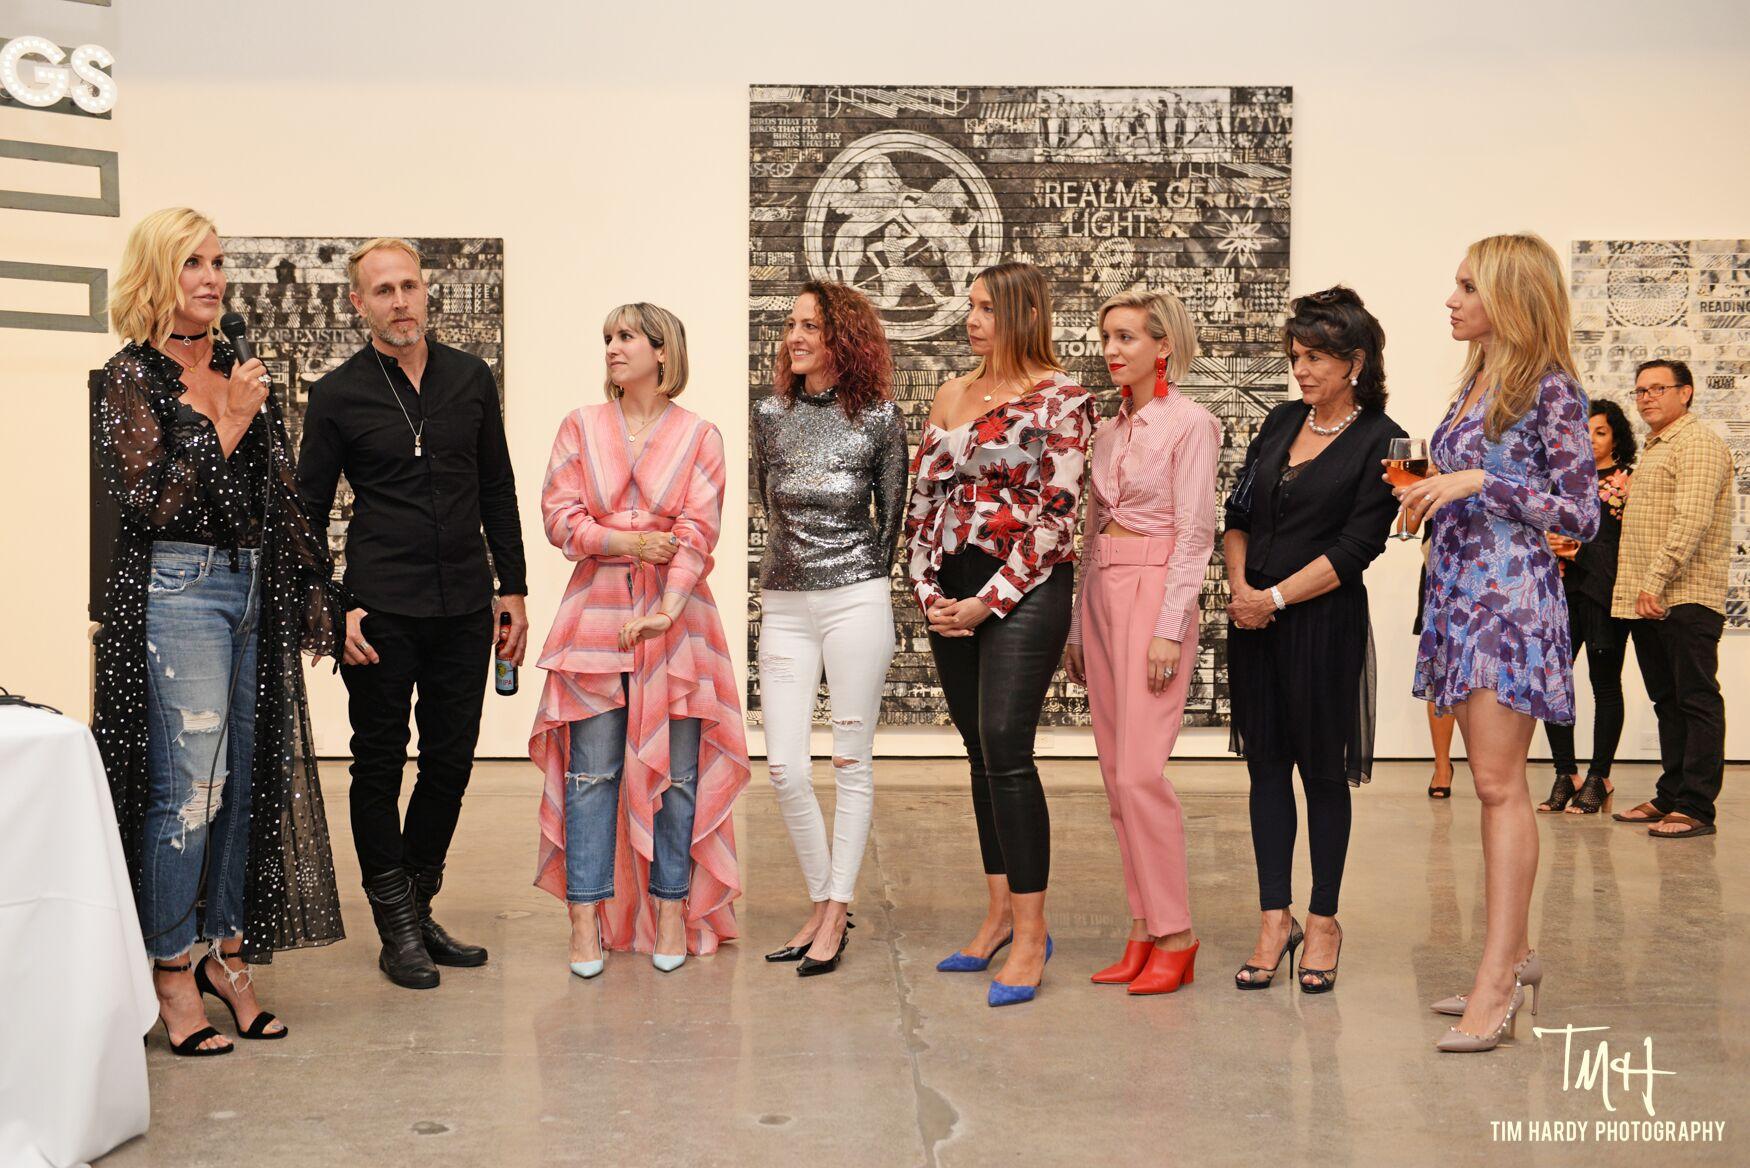 madison gallery team and james verbicky 2018.jpeg